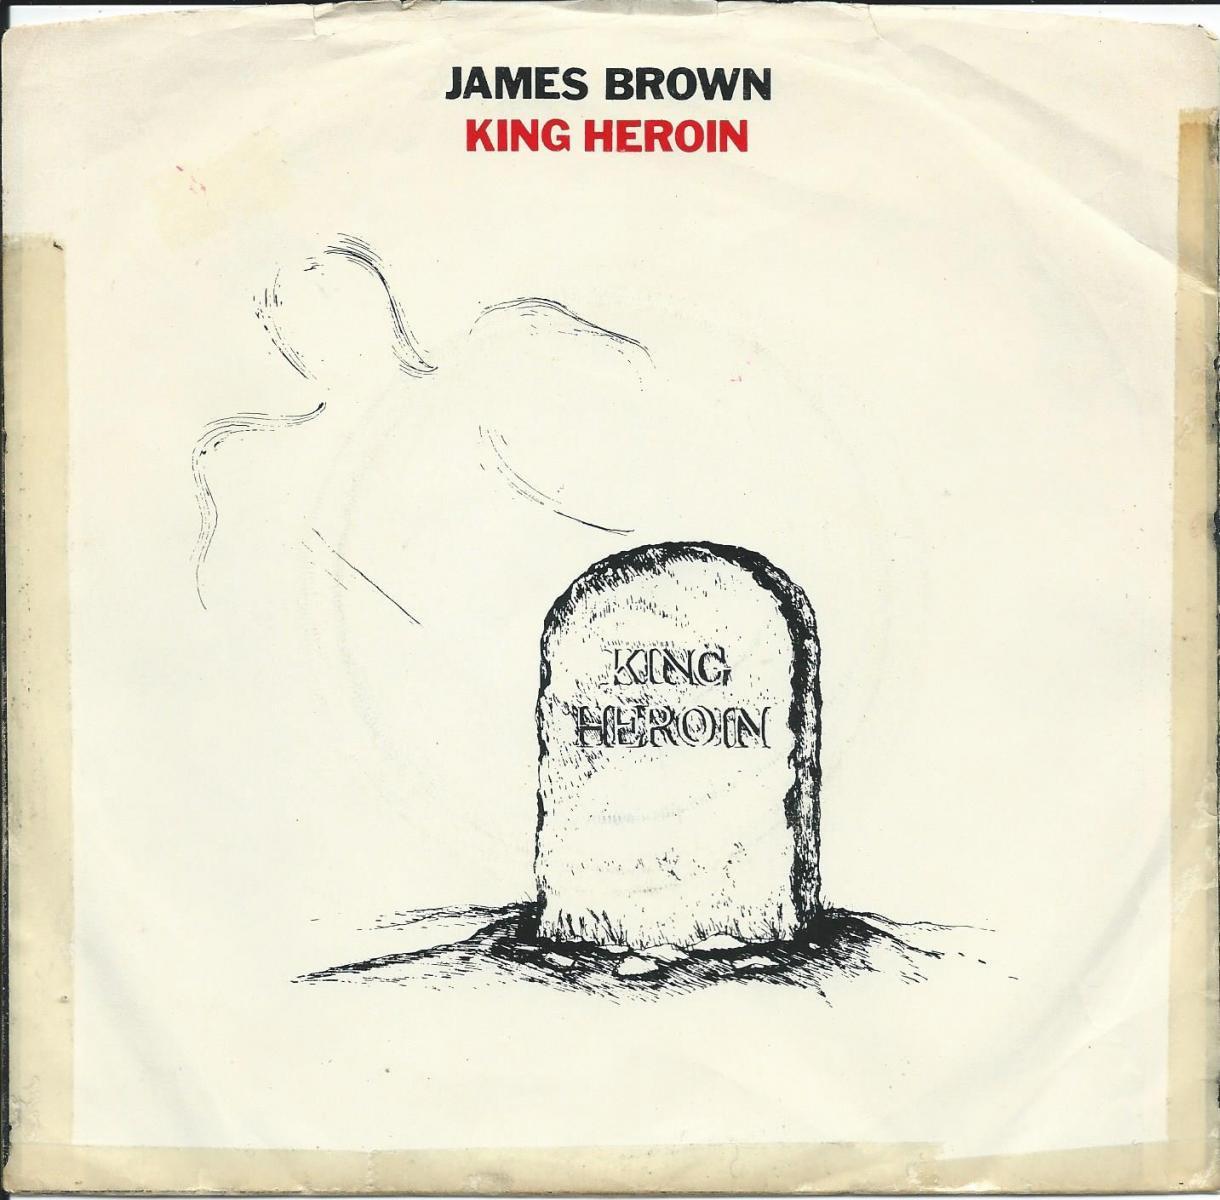 JAMES BROWN / KING HEROIN / THEME FROM KING HEROIN (7